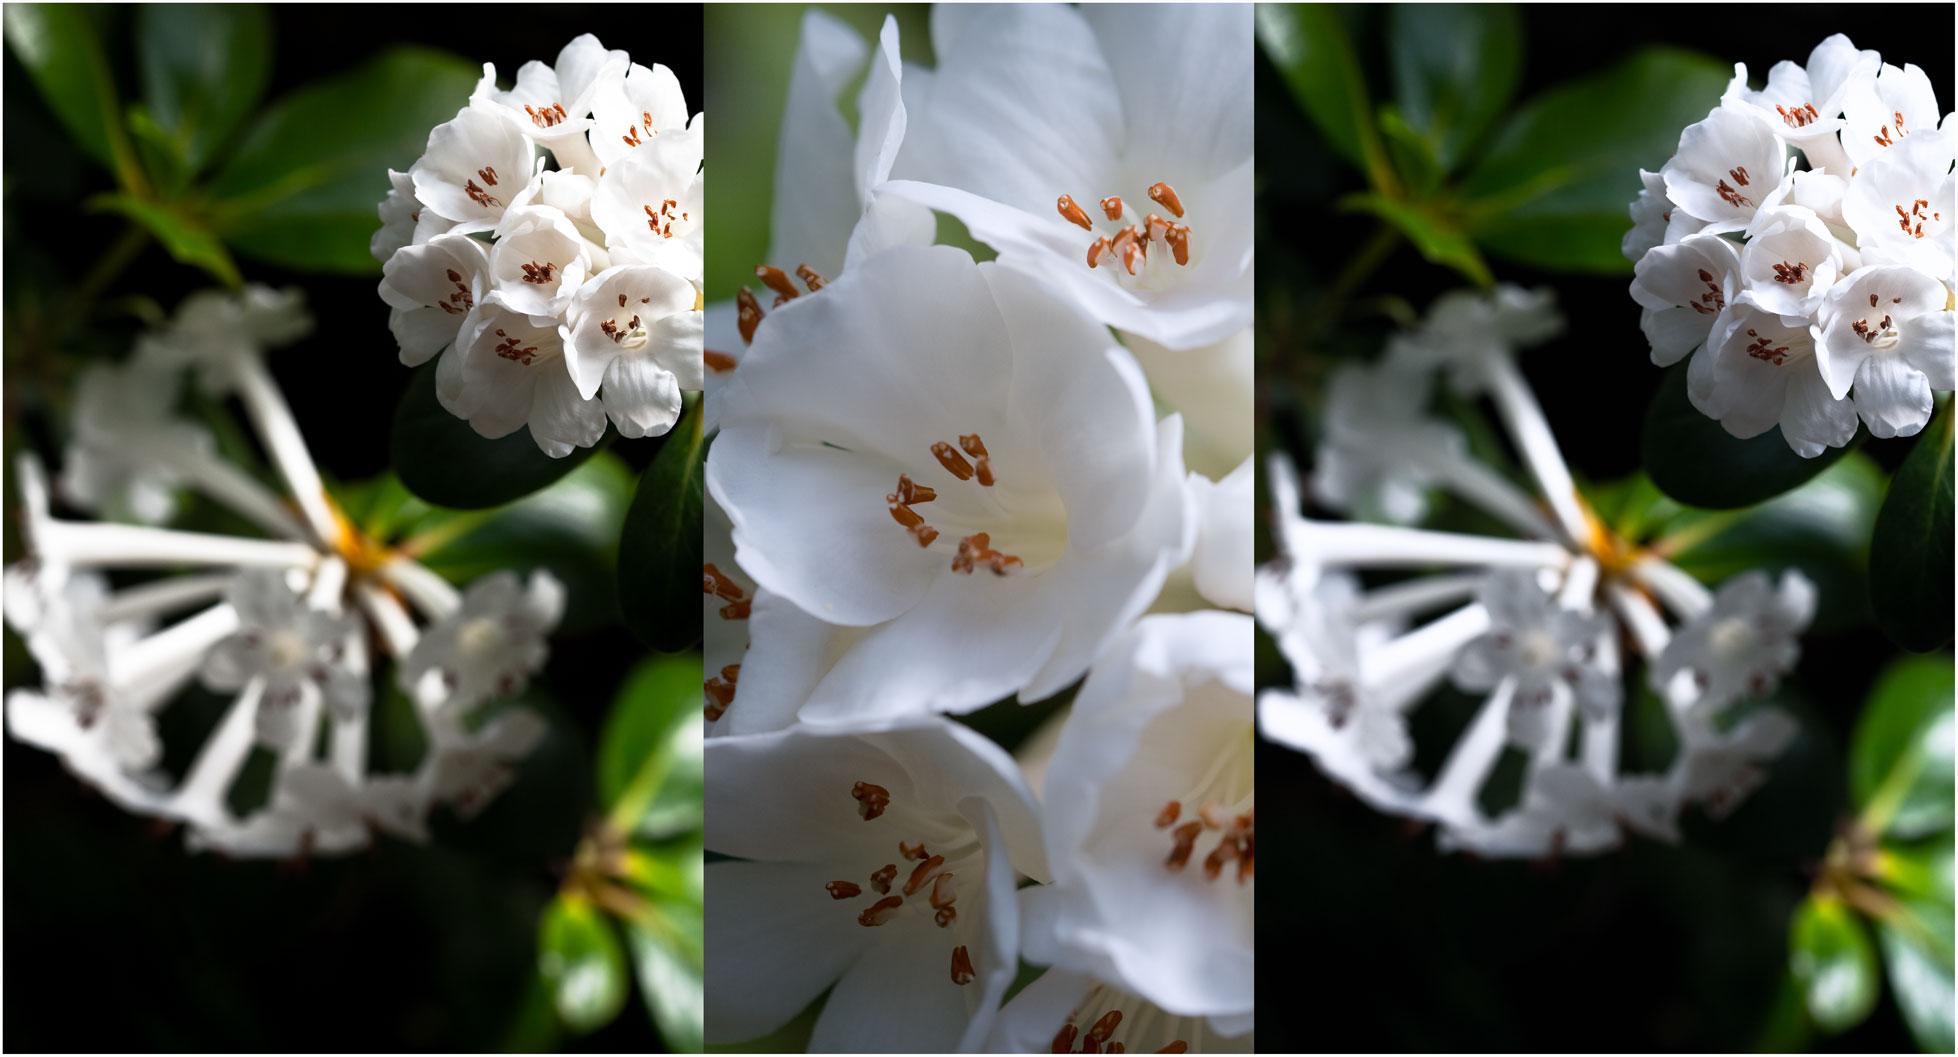 Blütencollage